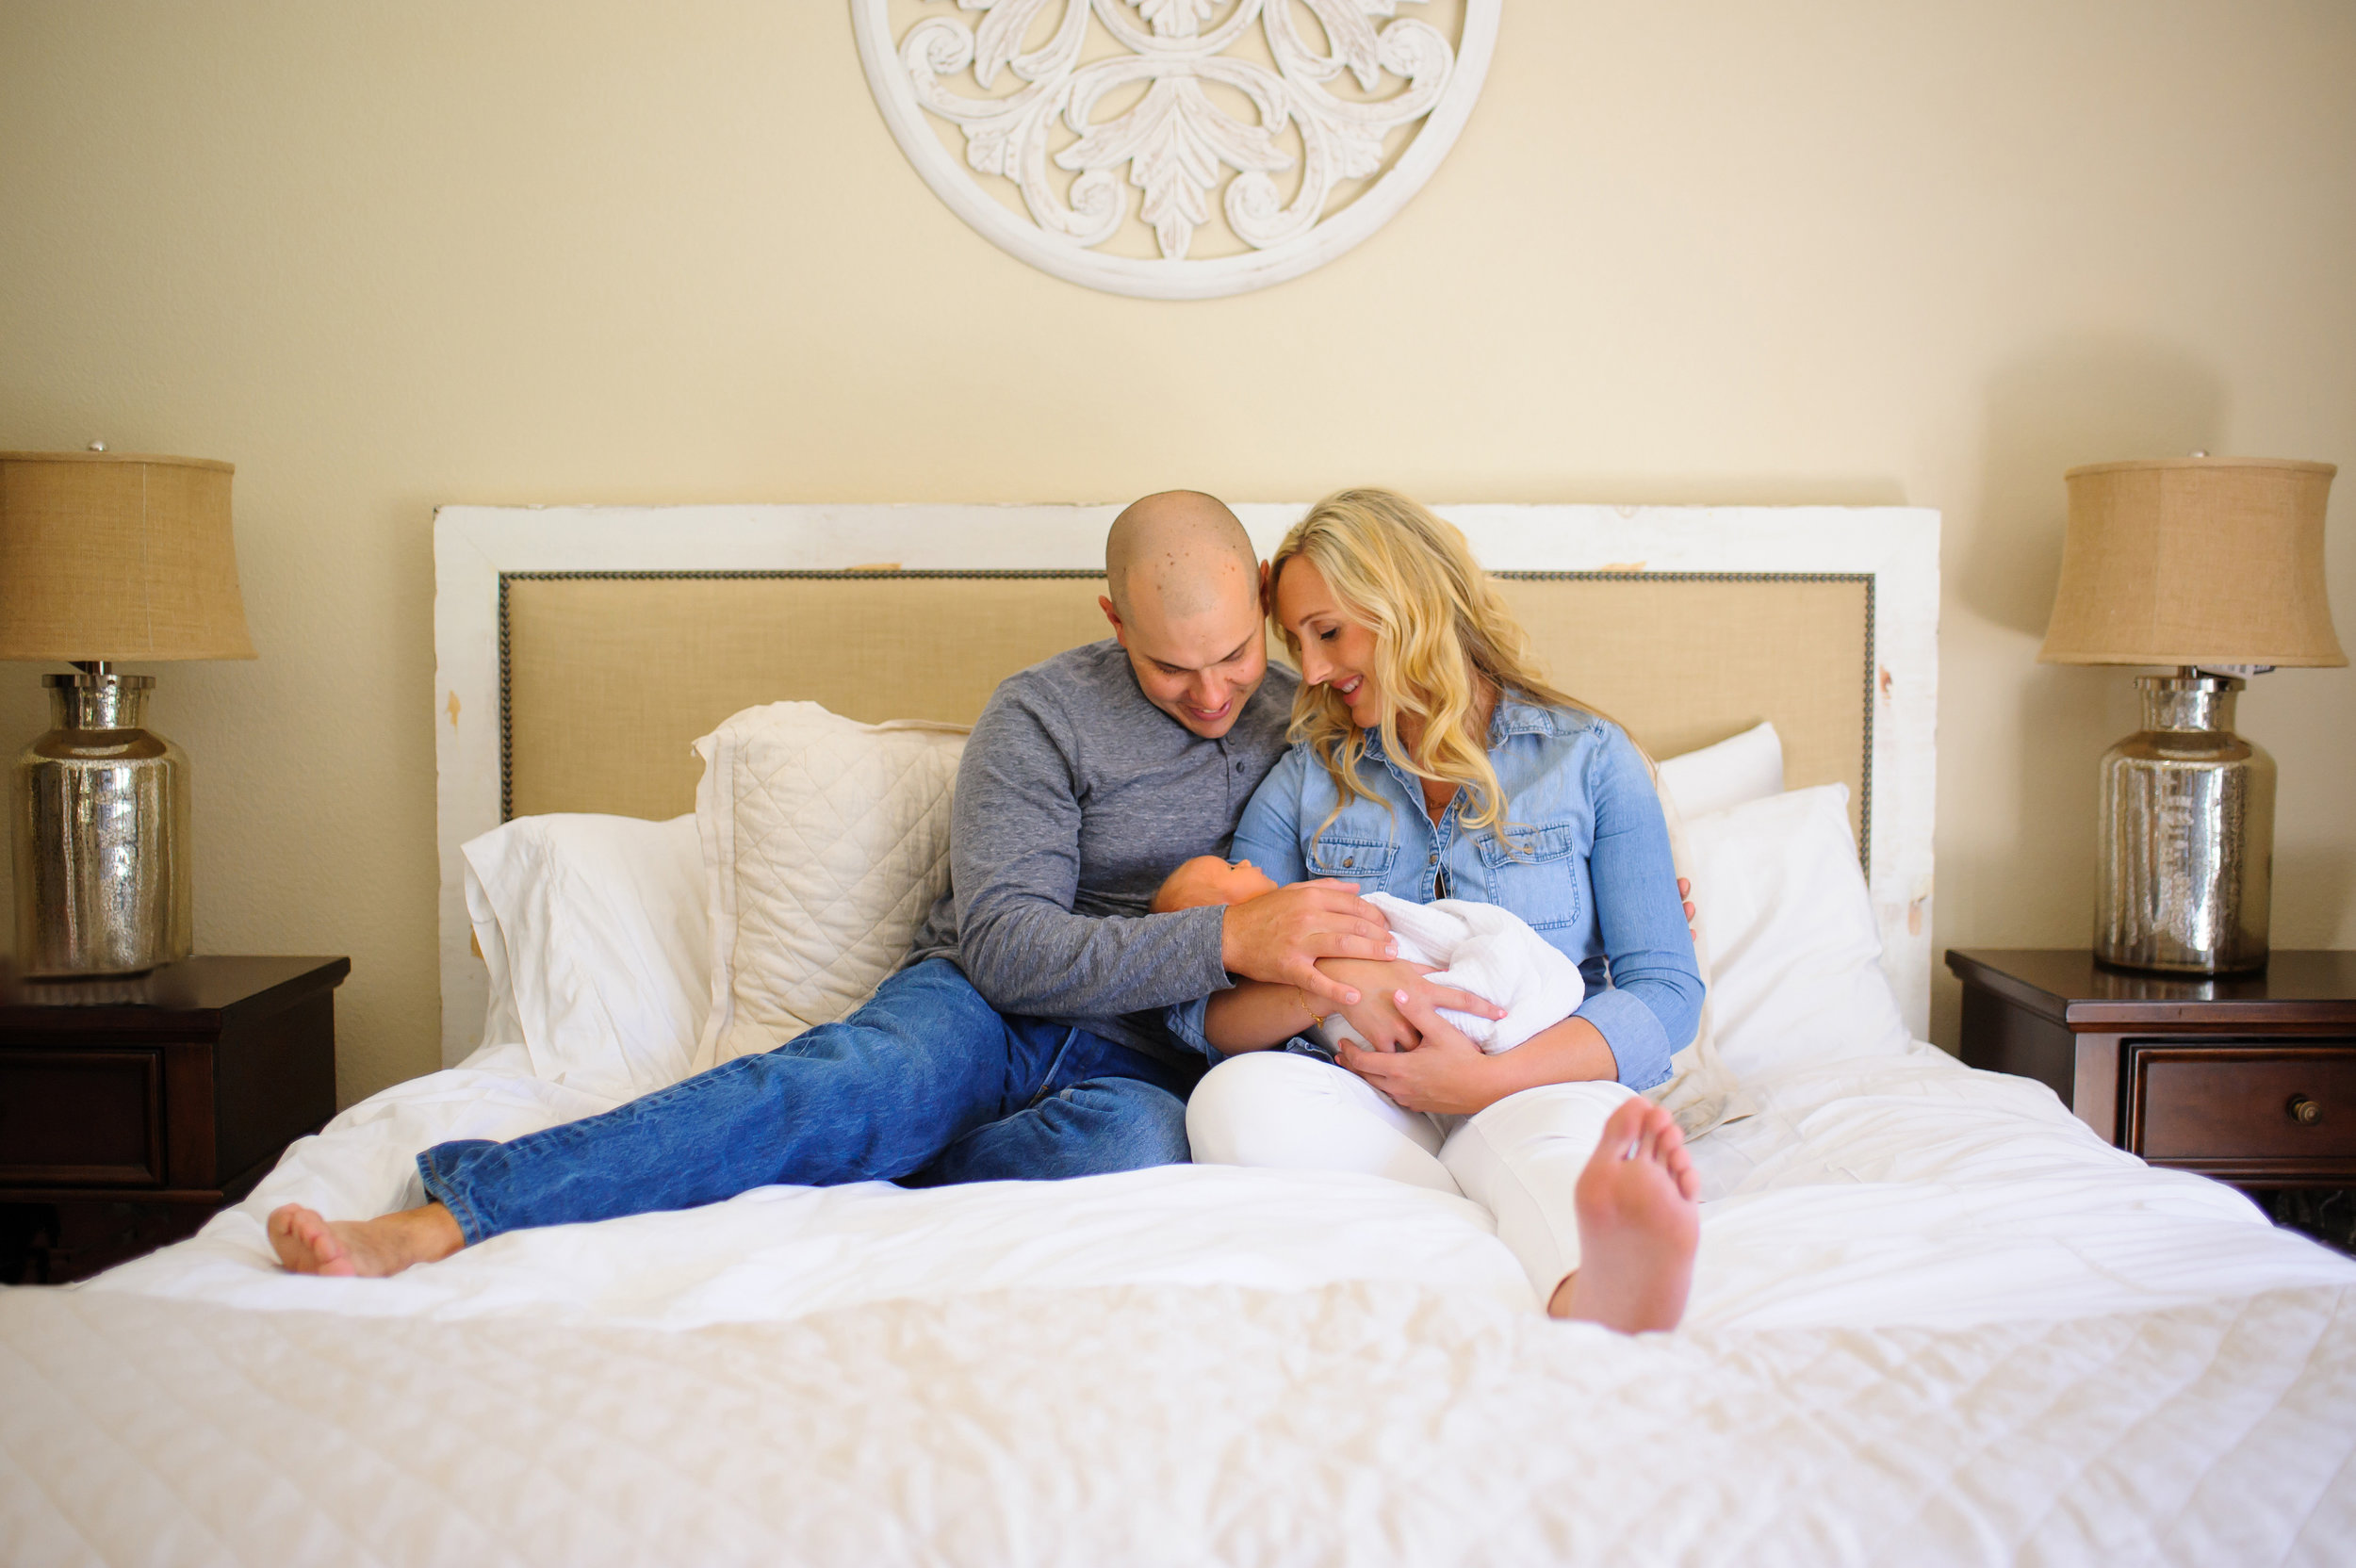 golden-family-100-sacramento-family-photographer-katherine-nicole-photography.JPG